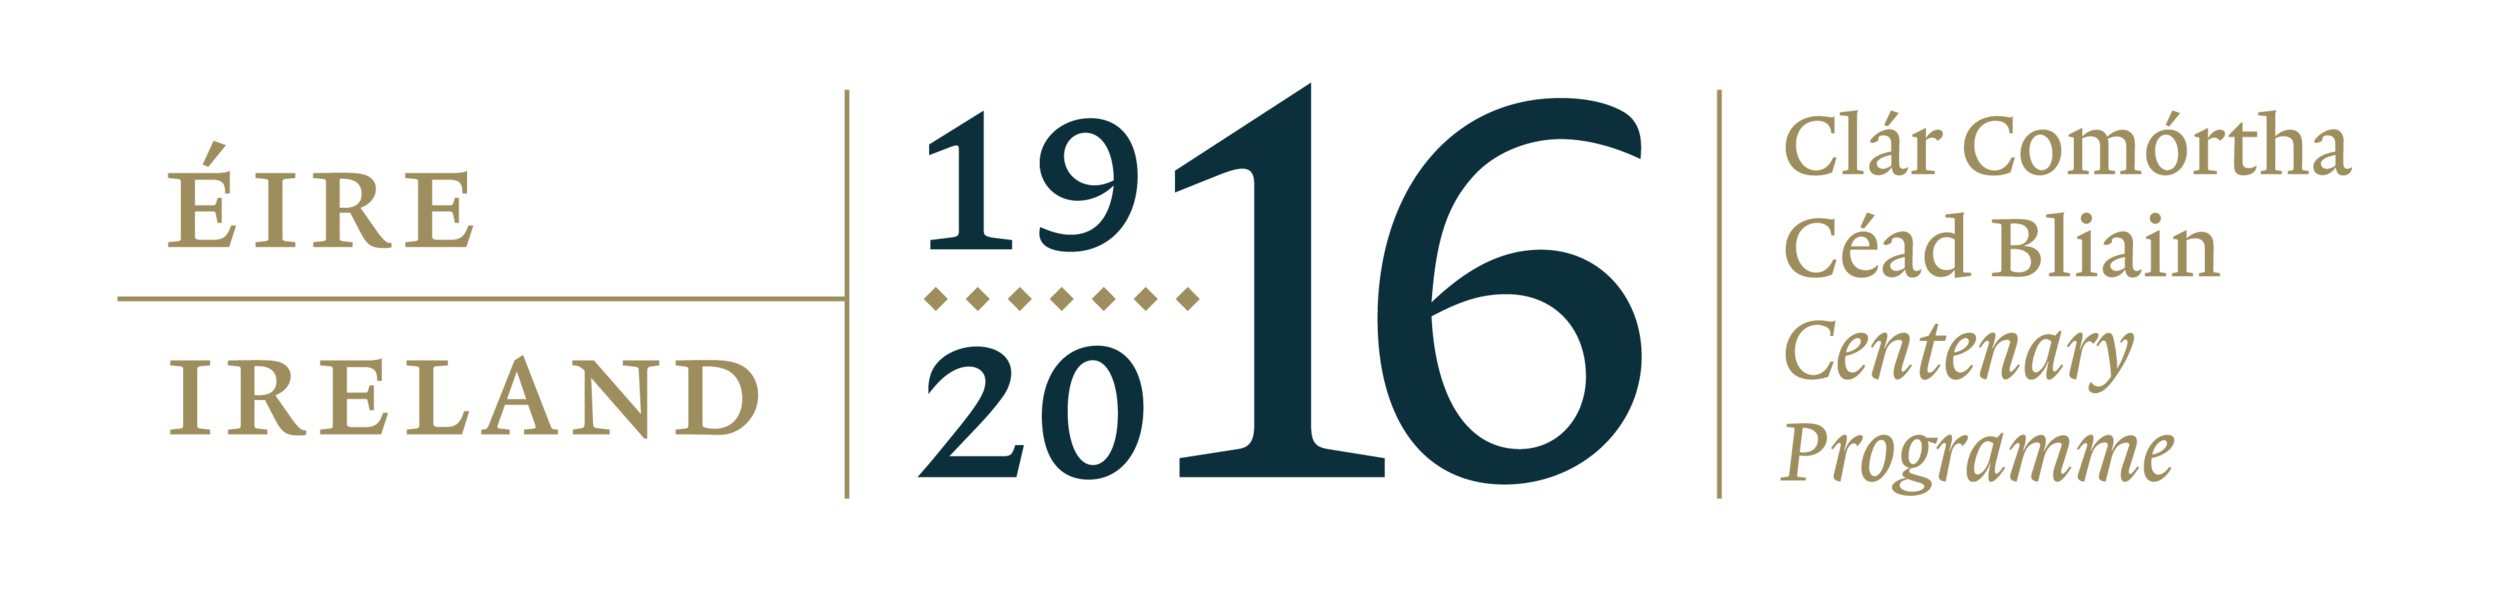 Ireland Centenary Programme 2016